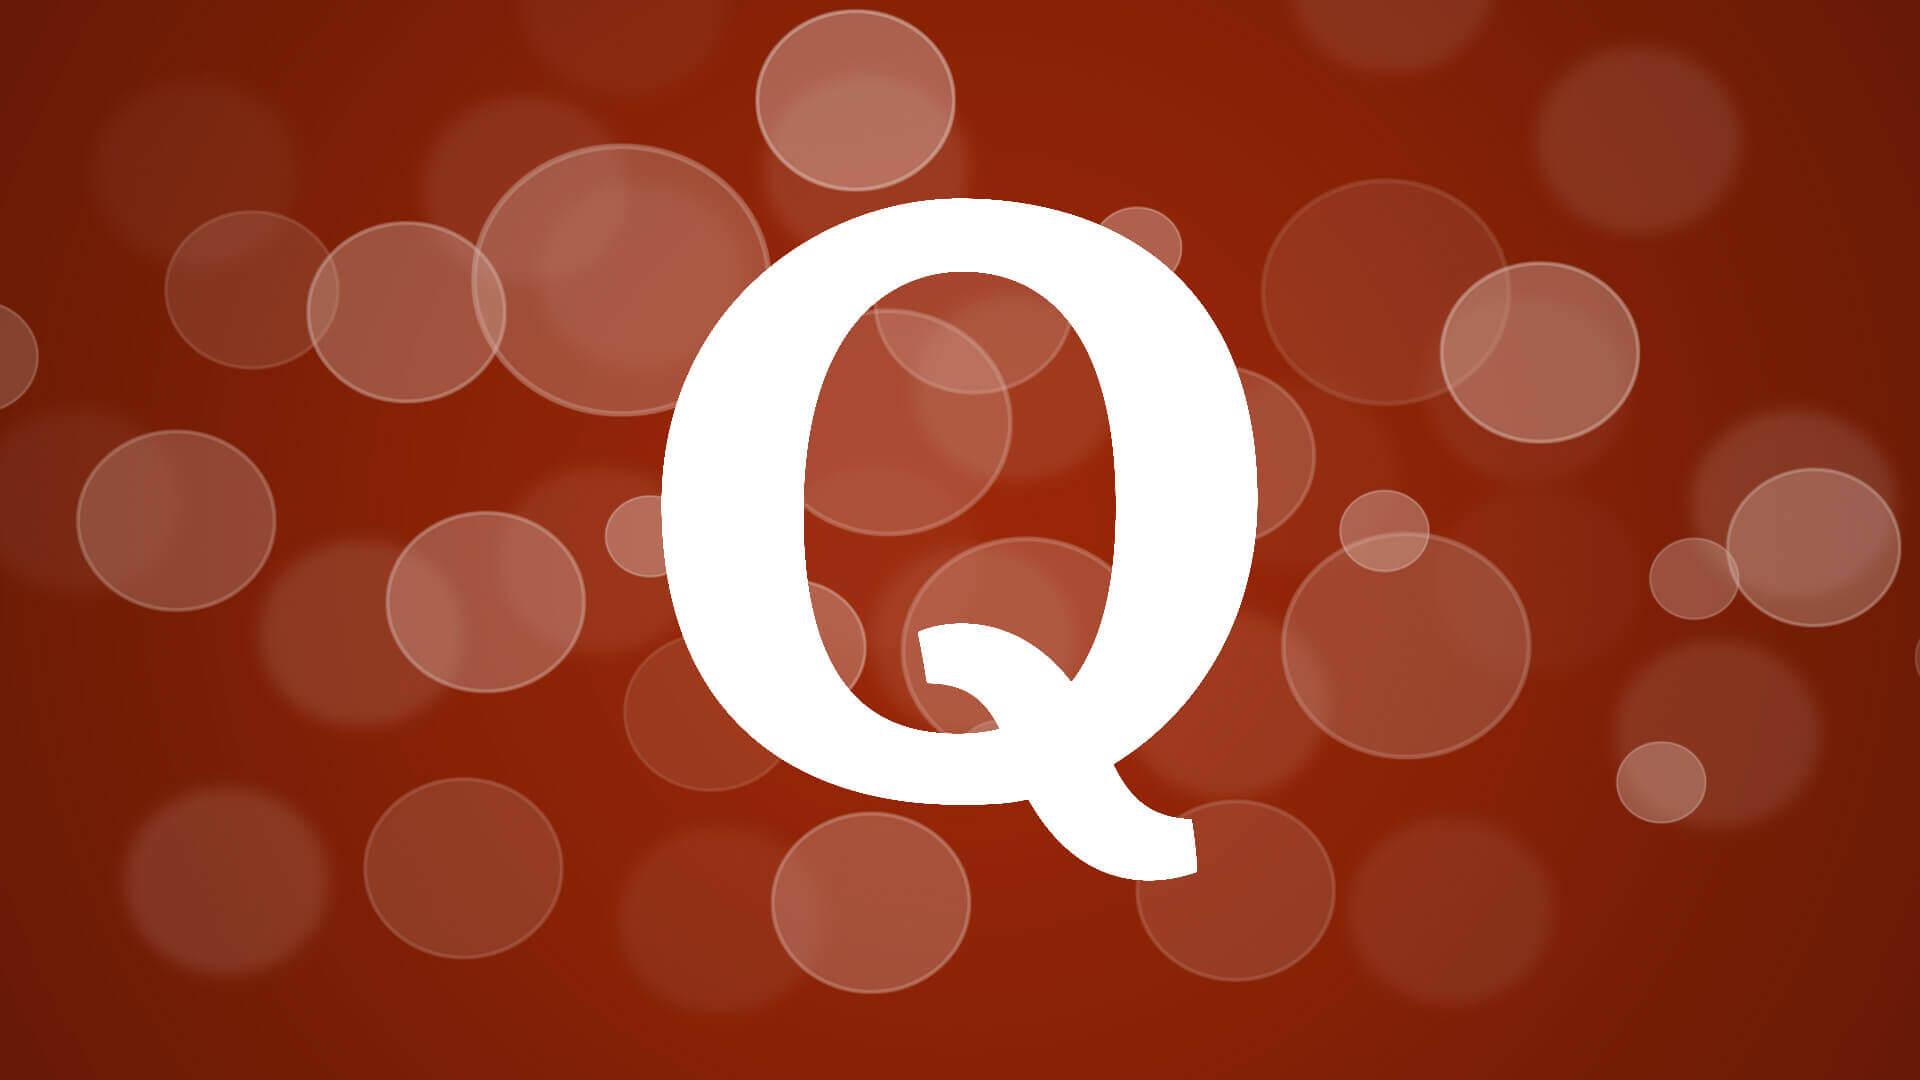 Quora - Ryan yockey - The Yock Answers